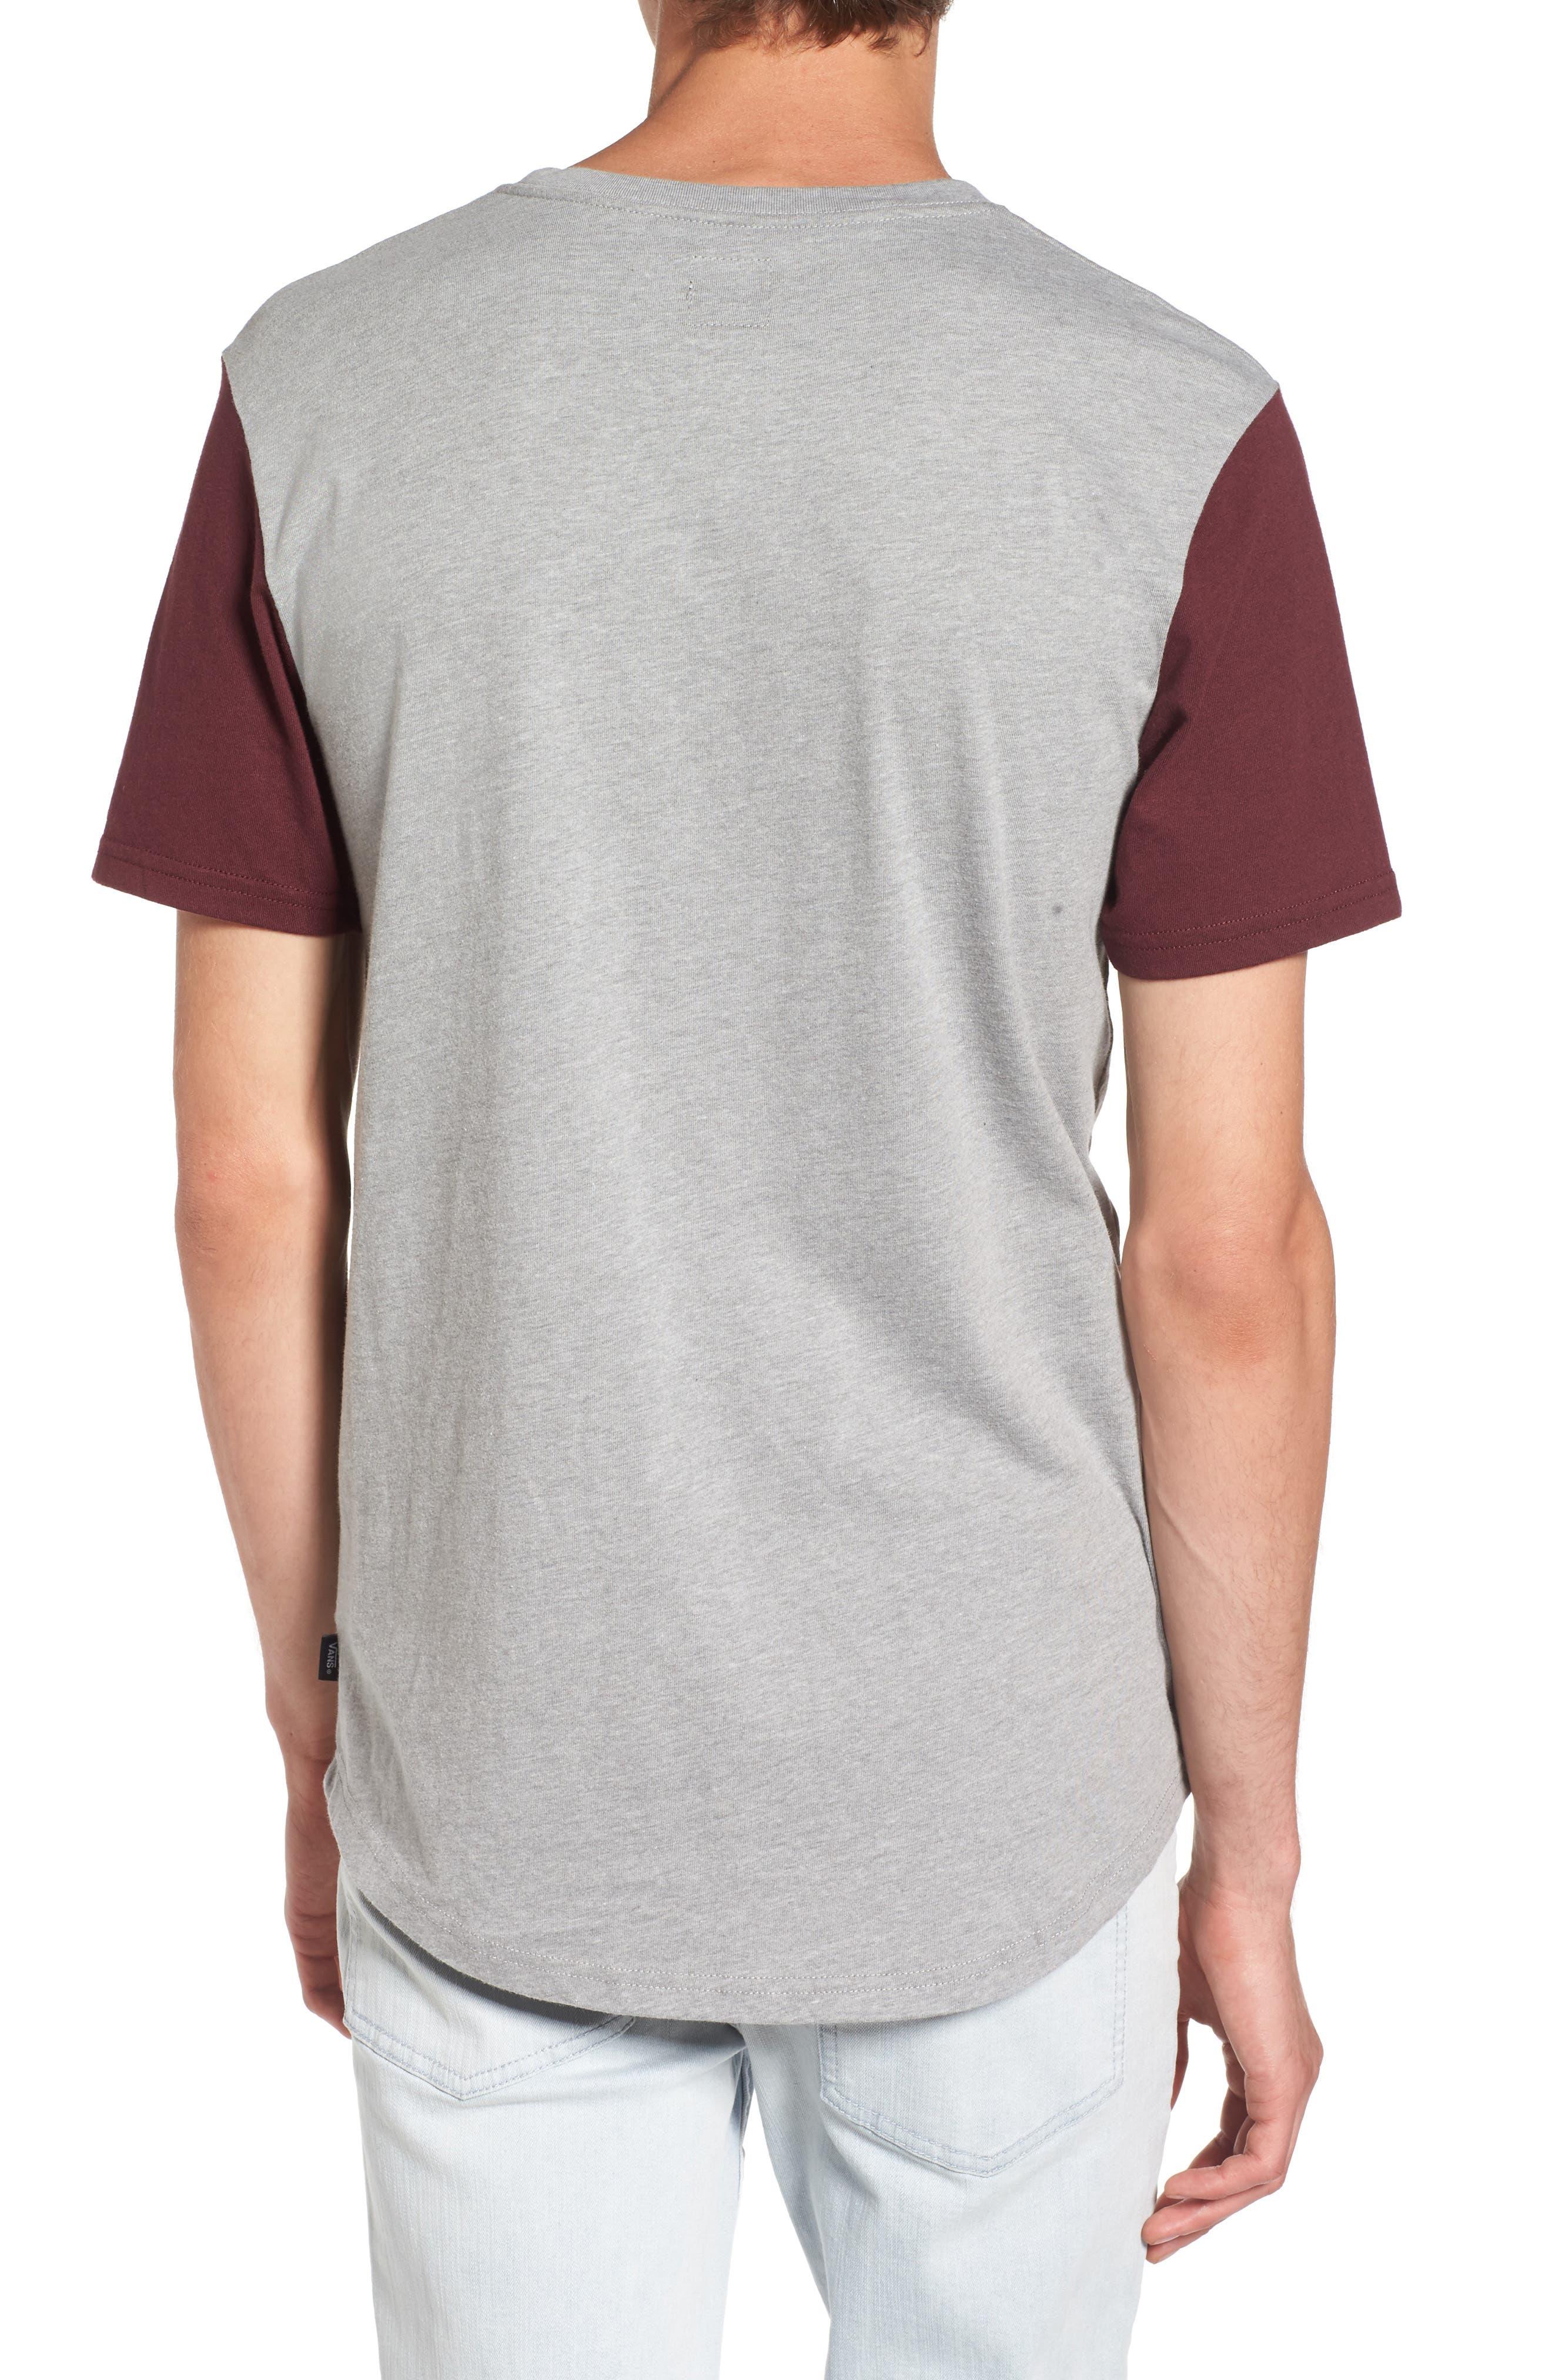 Hitson II Henley T-Shirt,                             Alternate thumbnail 2, color,                             Cement Heather/ Port Royale